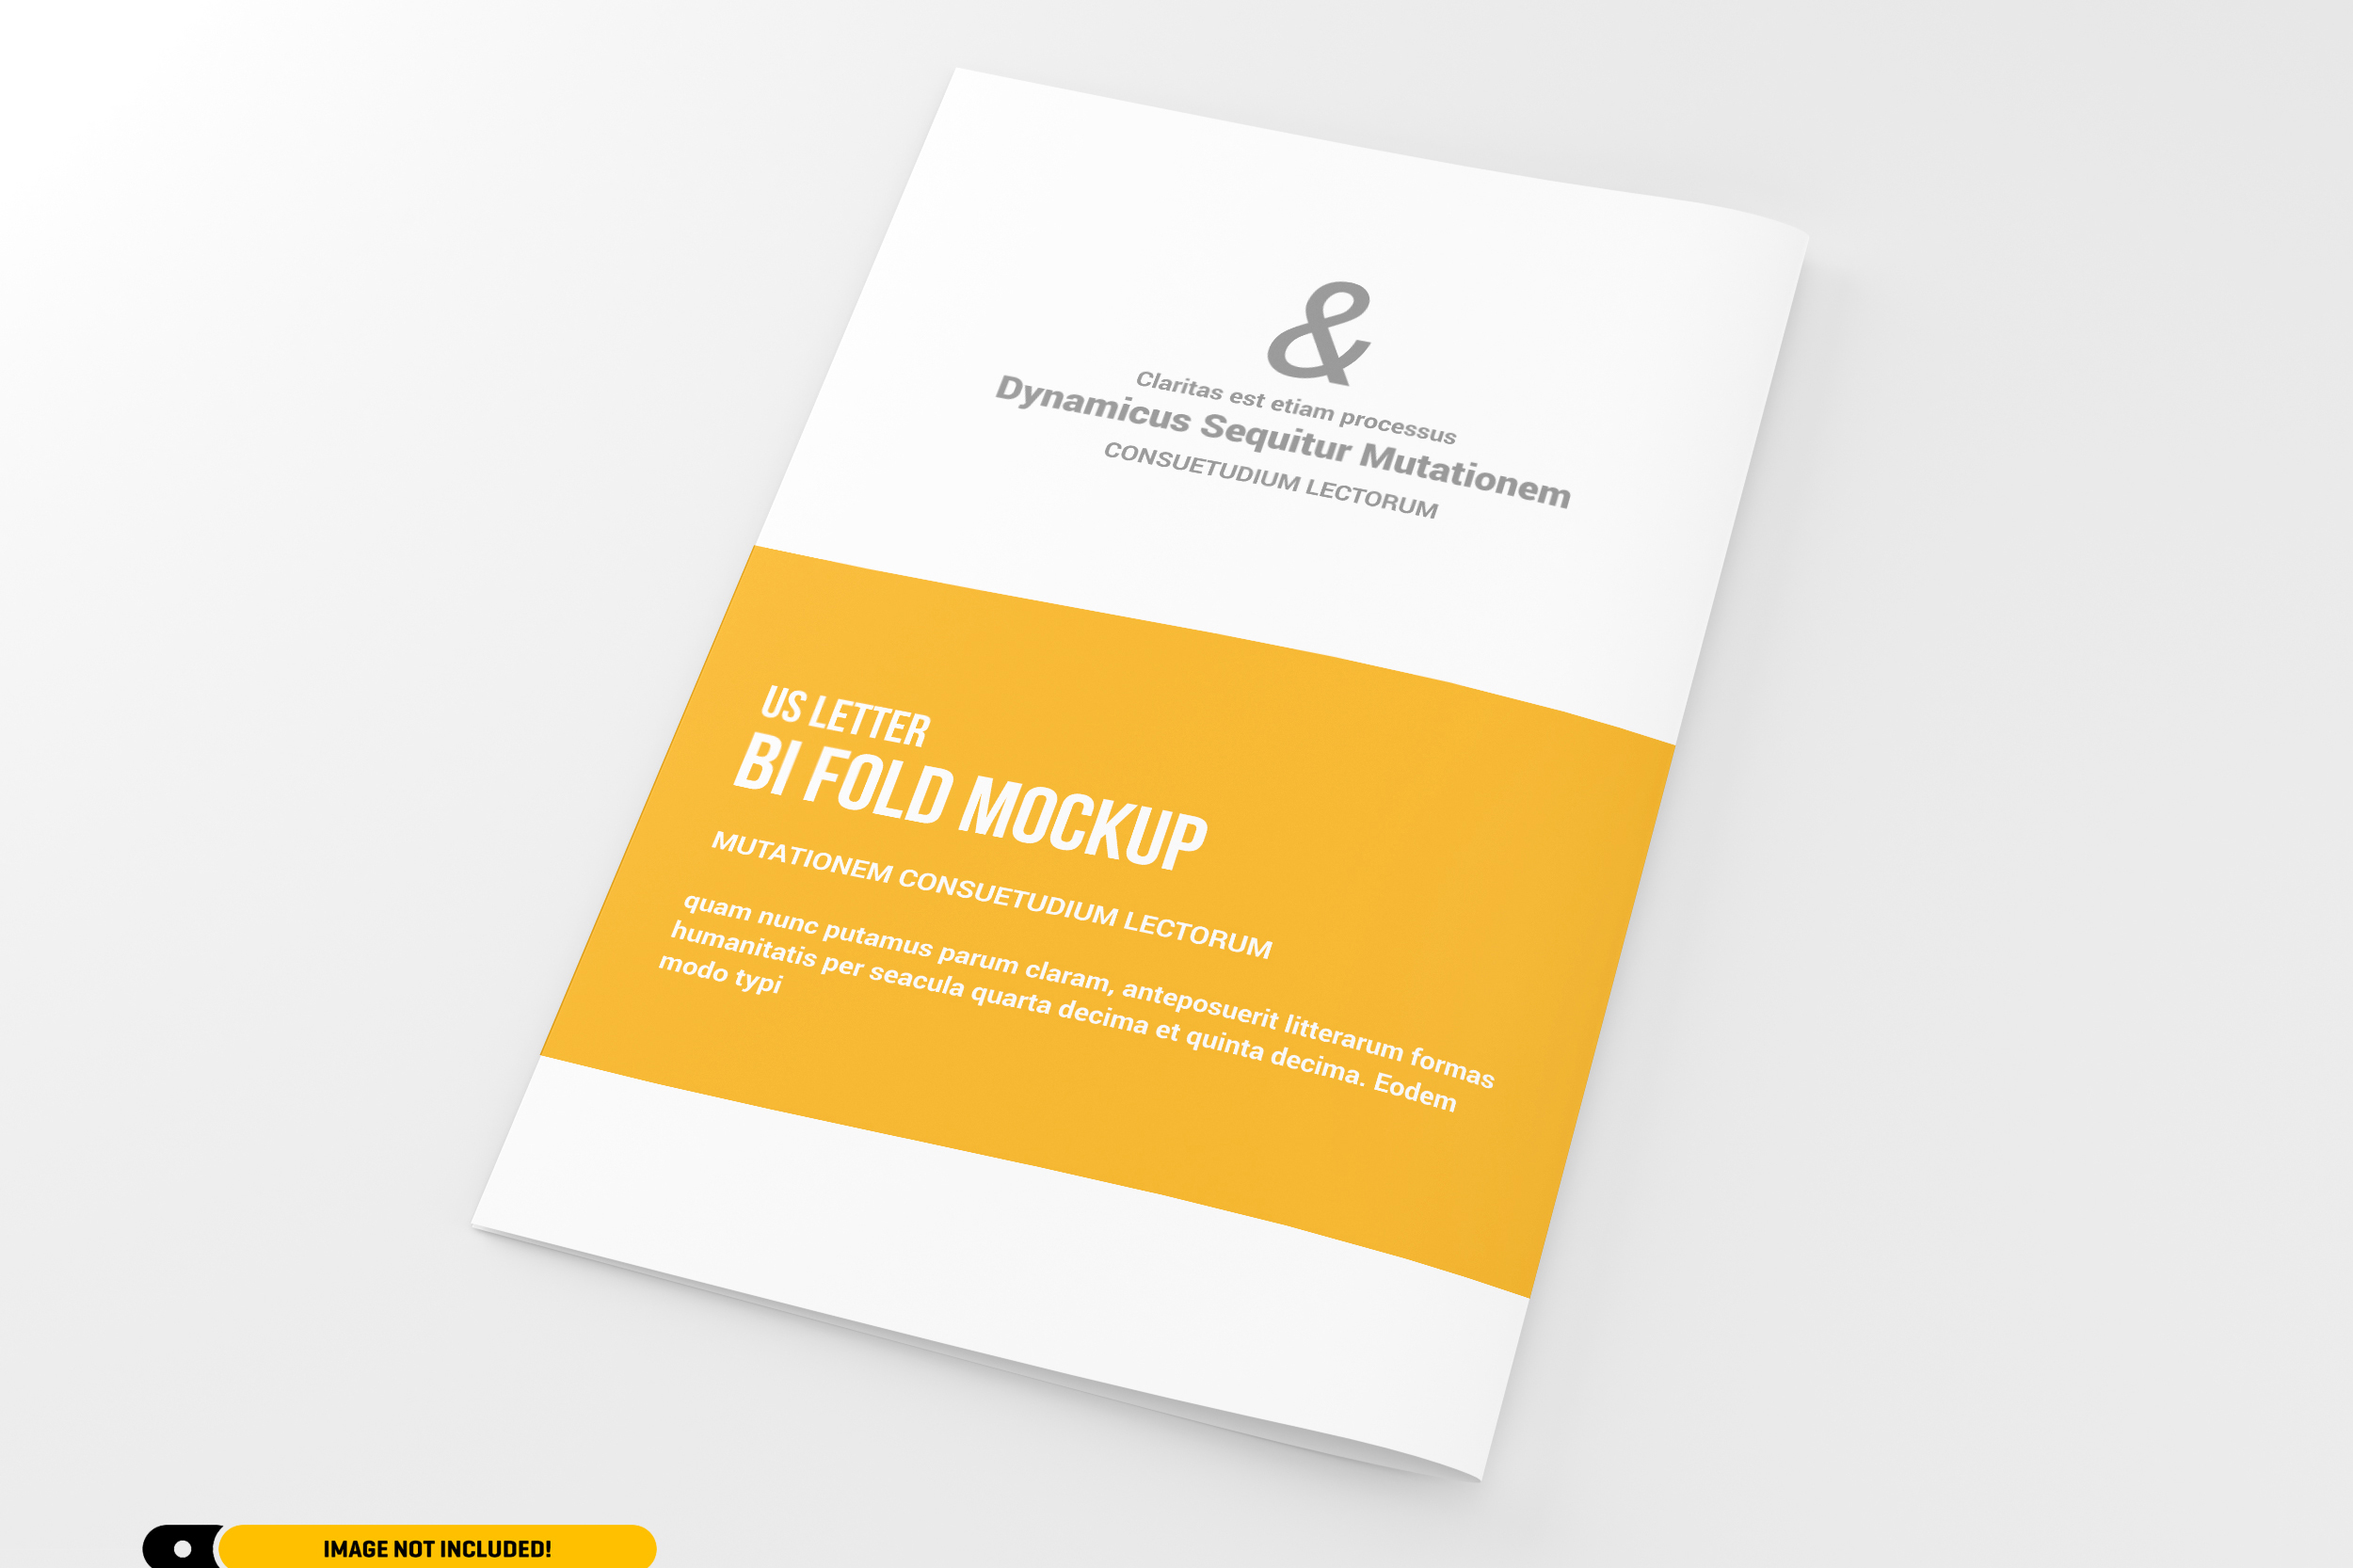 US Letter Bifold Brochure Mockup example image 2